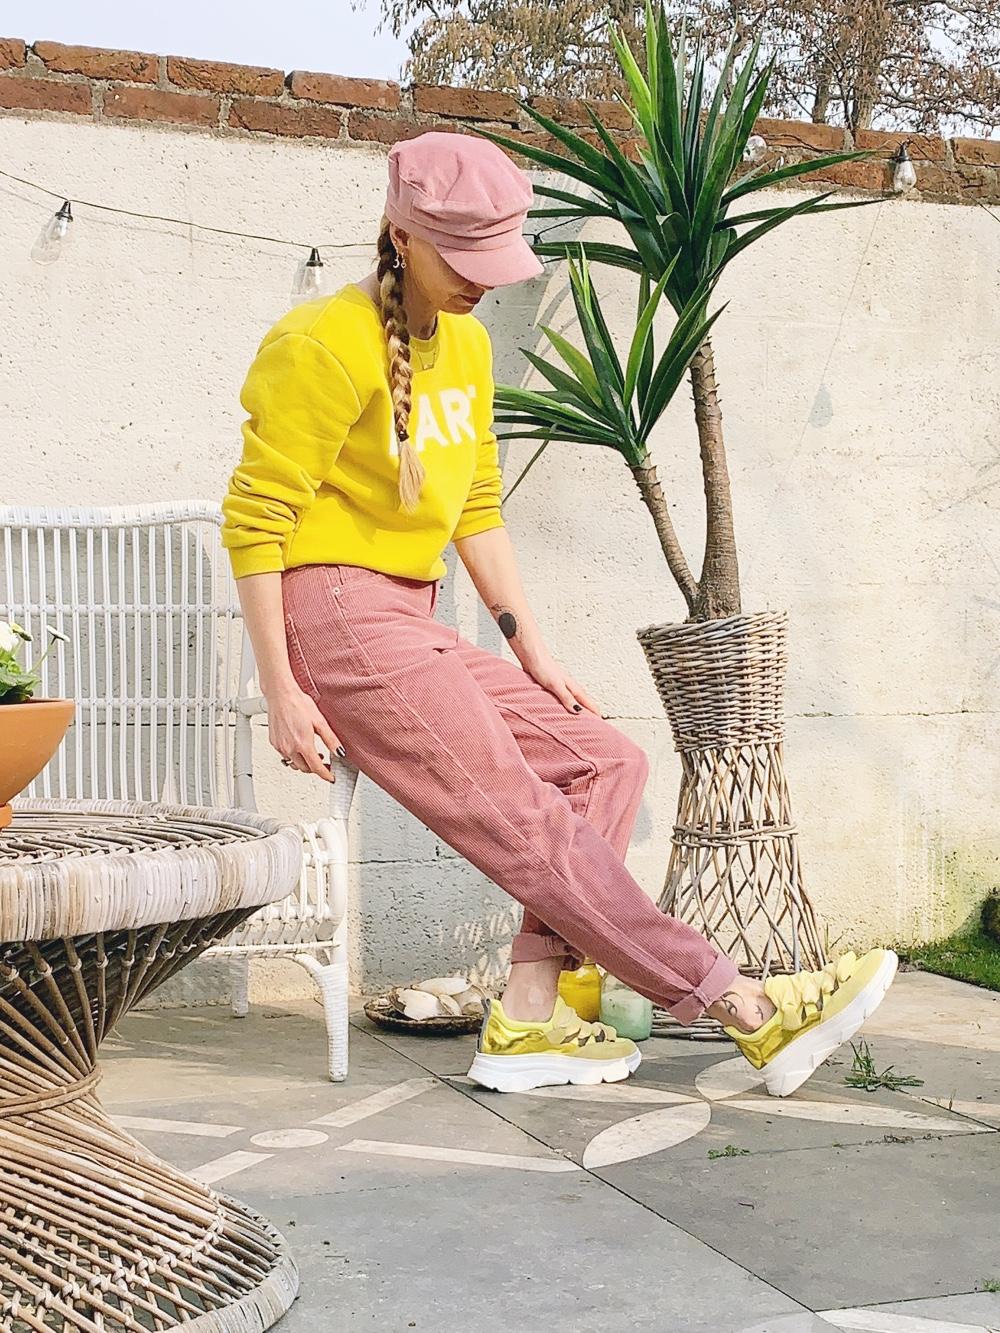 roze outfit met geel